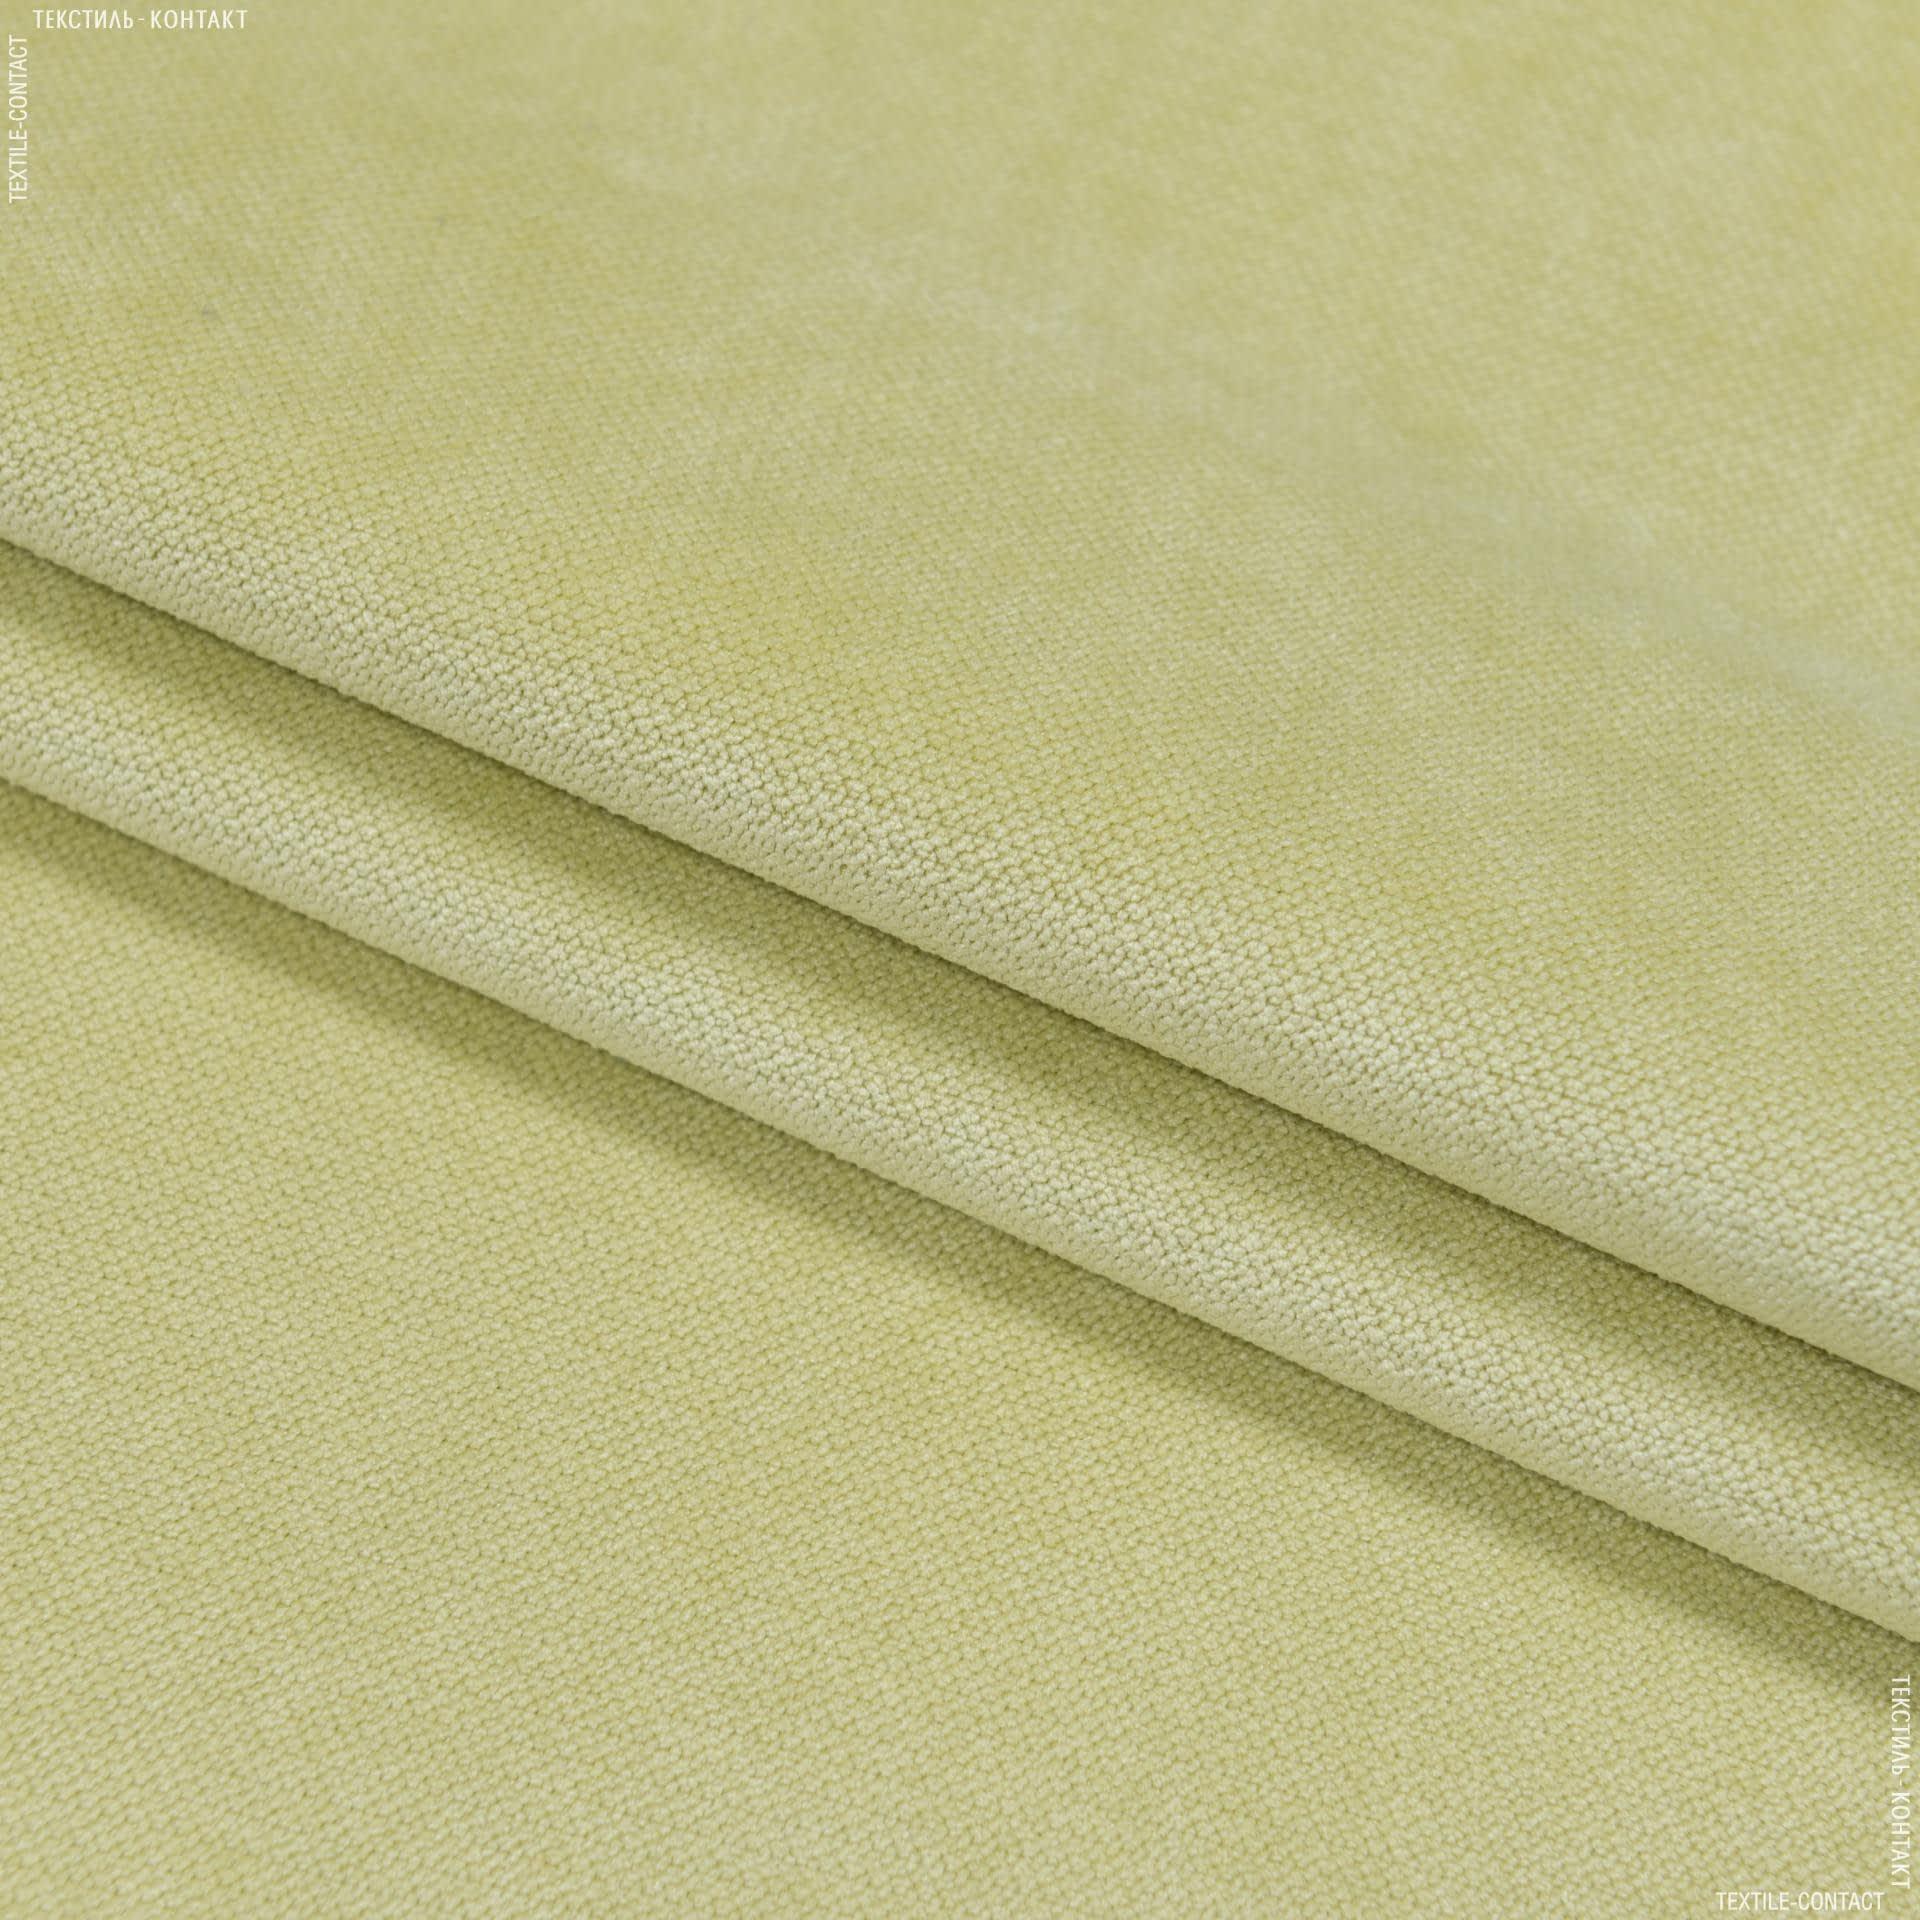 Ткани для мебели - Велюр будапешт/budapest зеленый чай